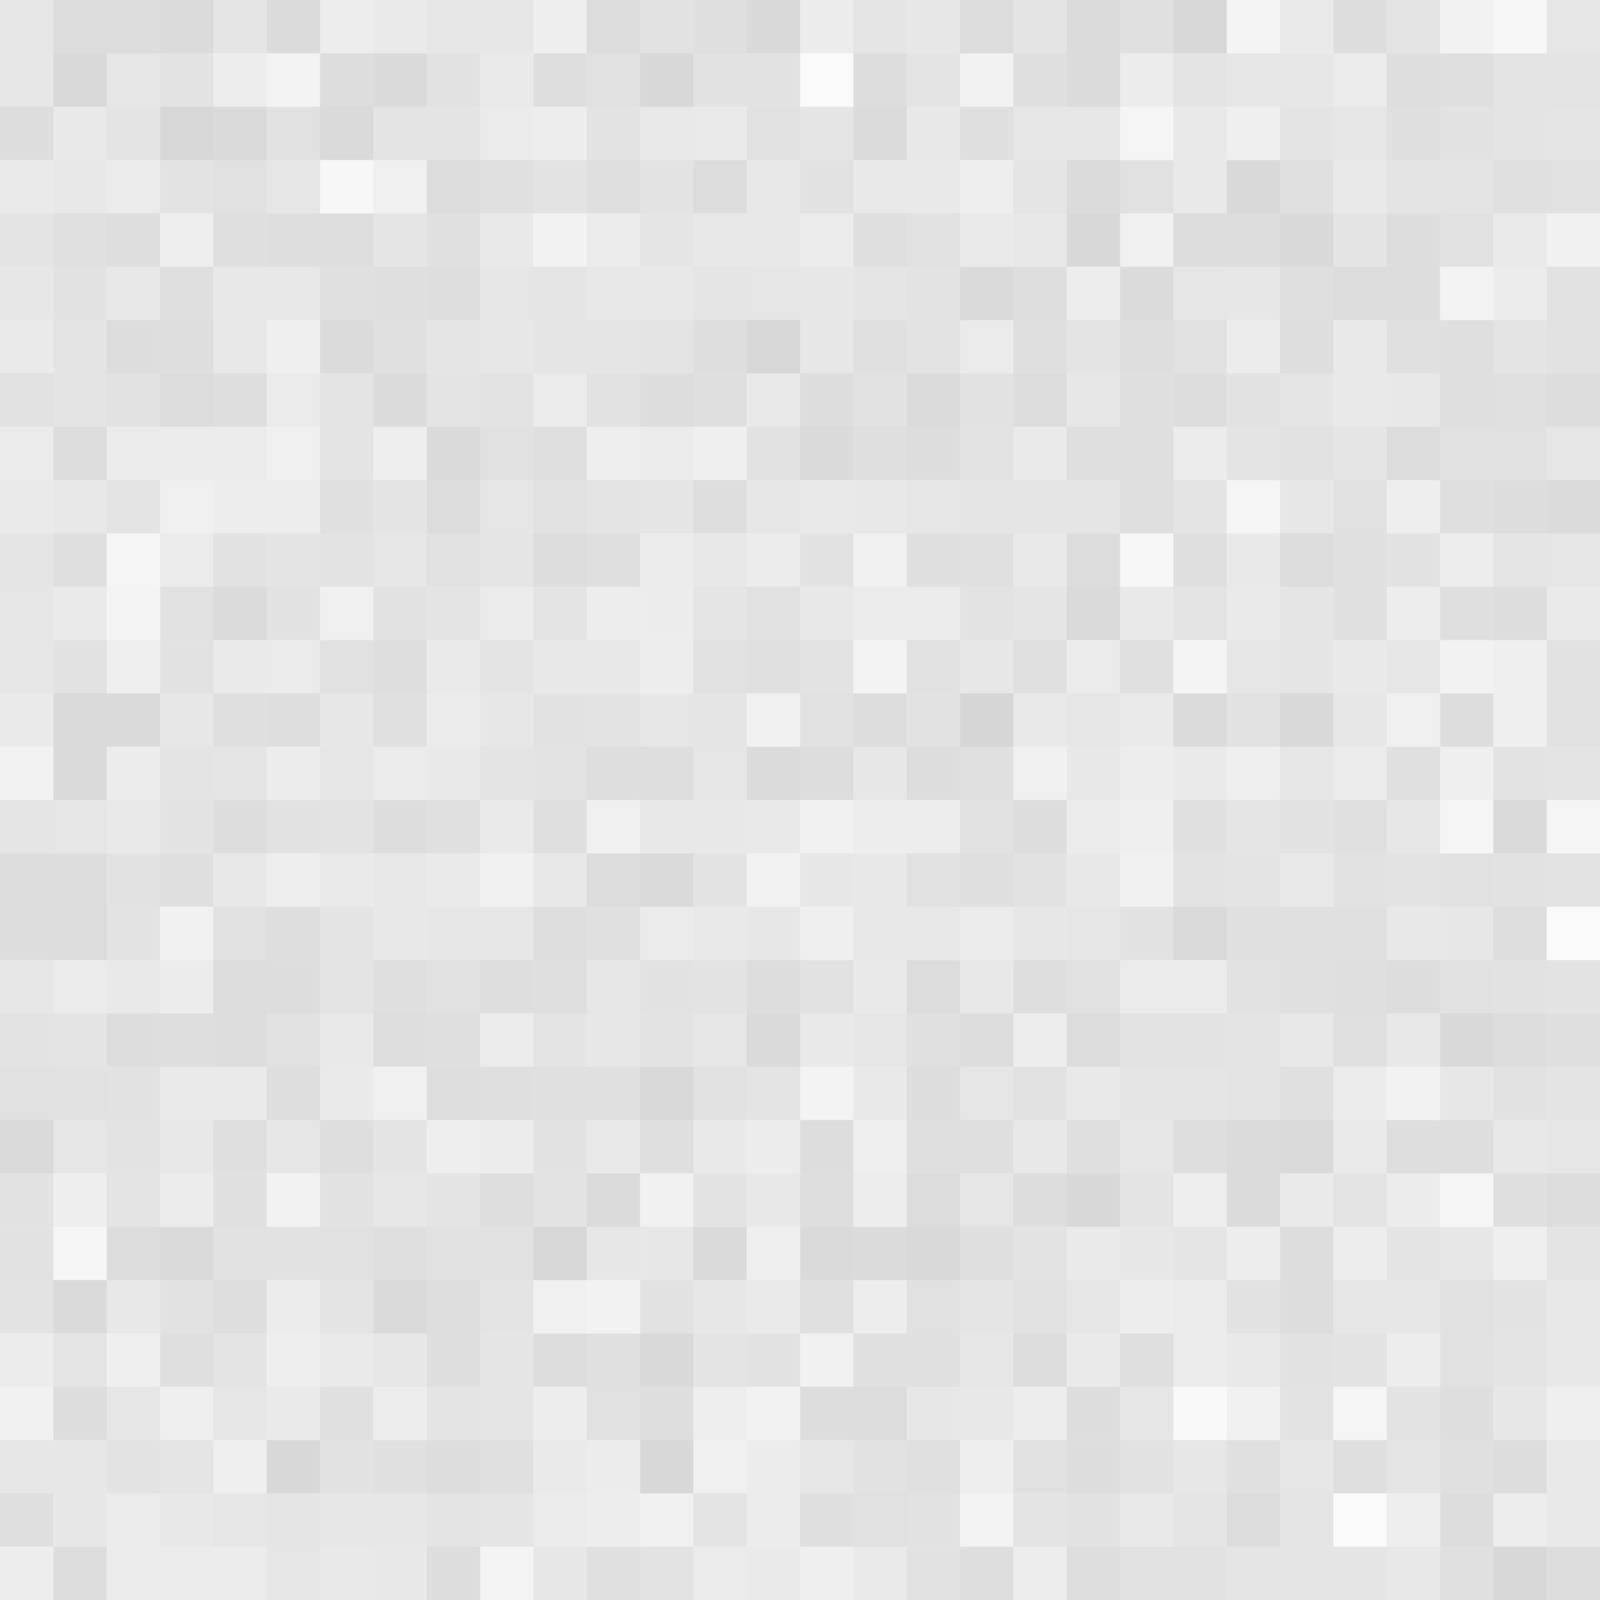 Gray Mosaic Background, Creative Design Templates